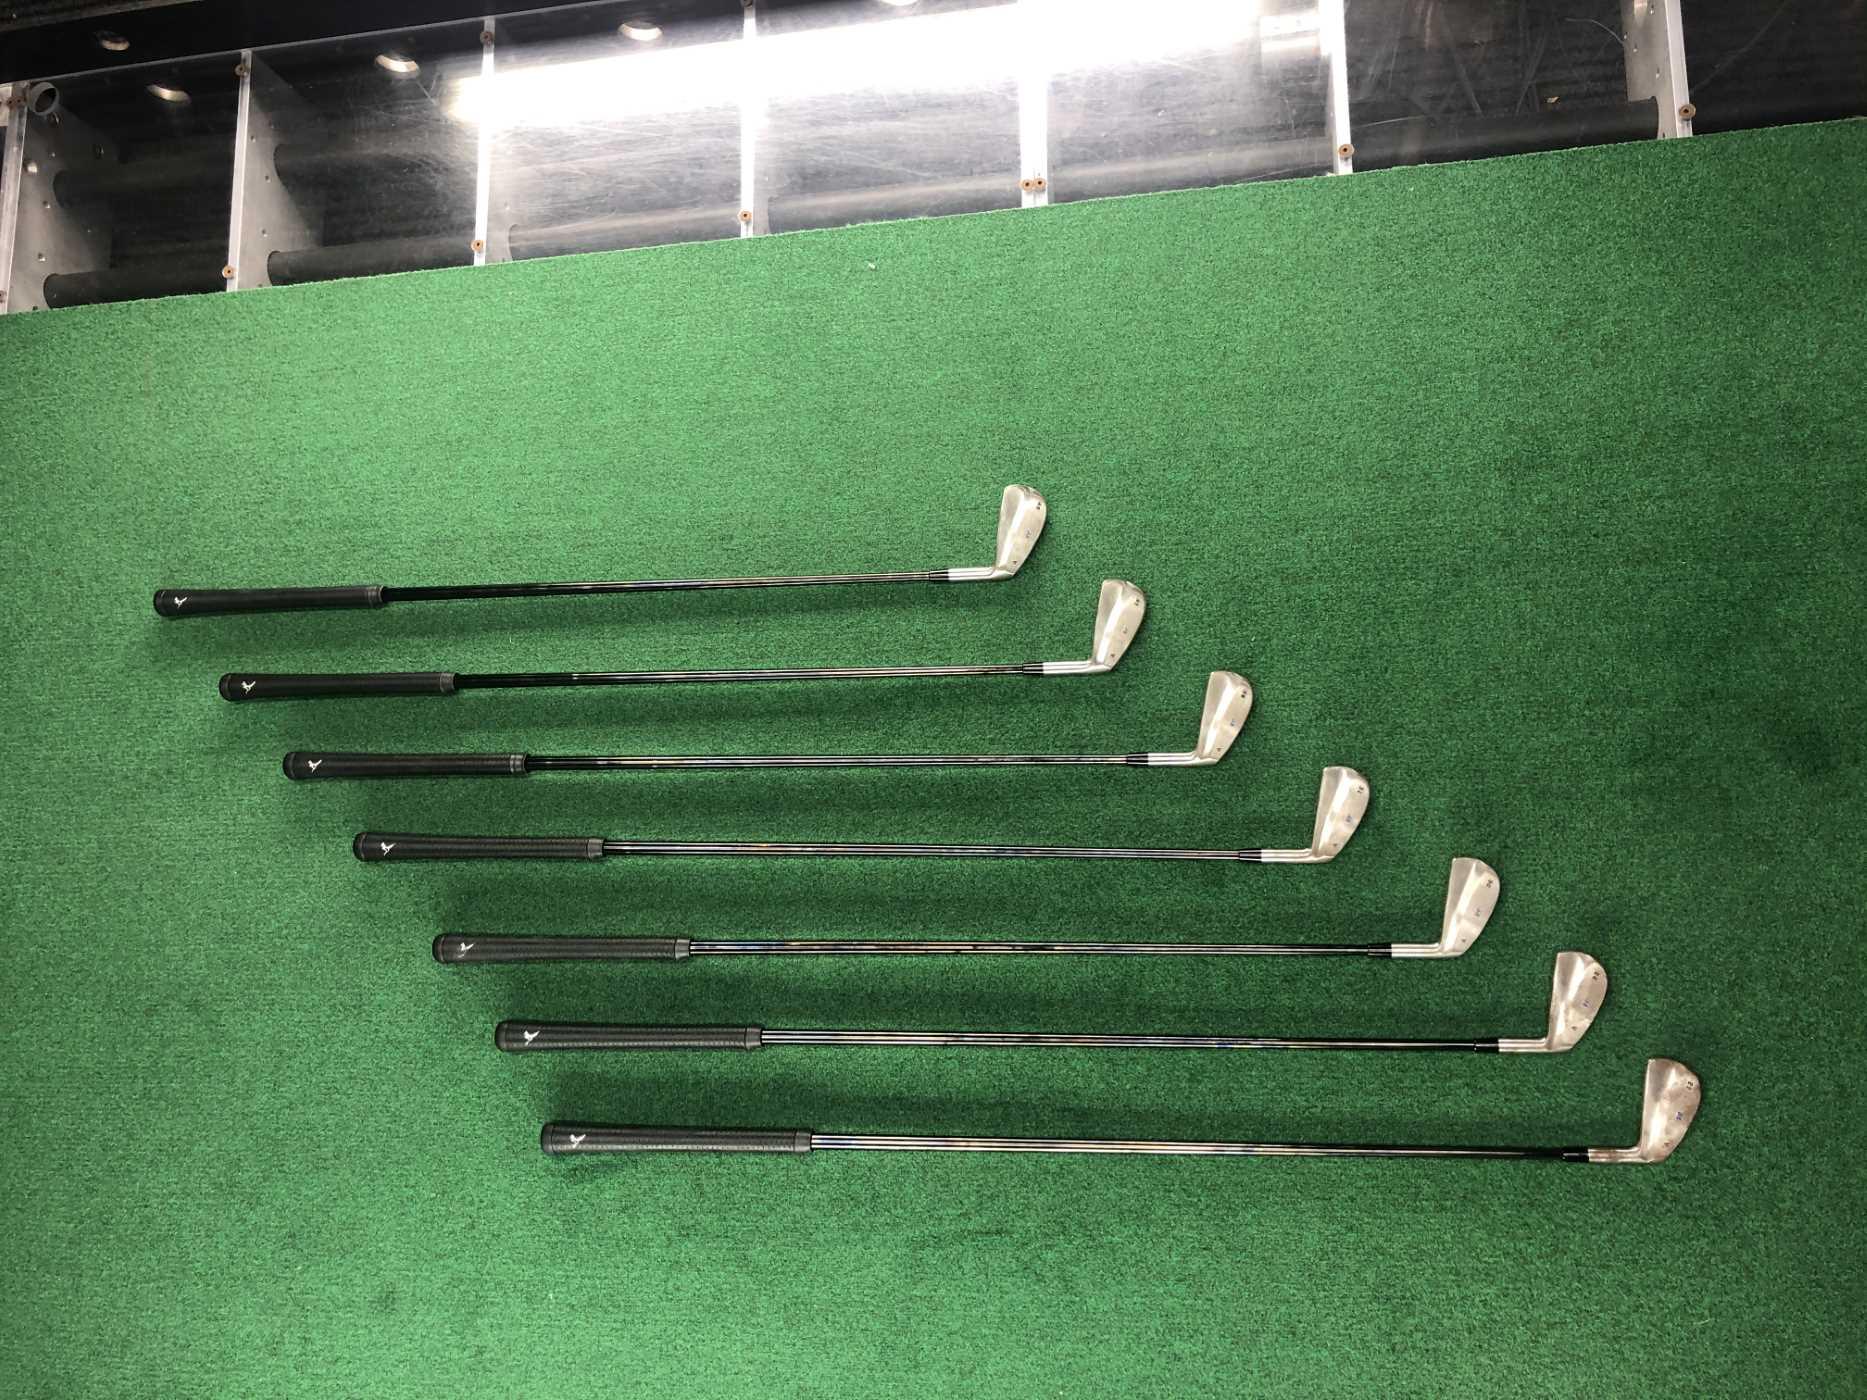 Custom Grind Kyoei KCM Blank Irons